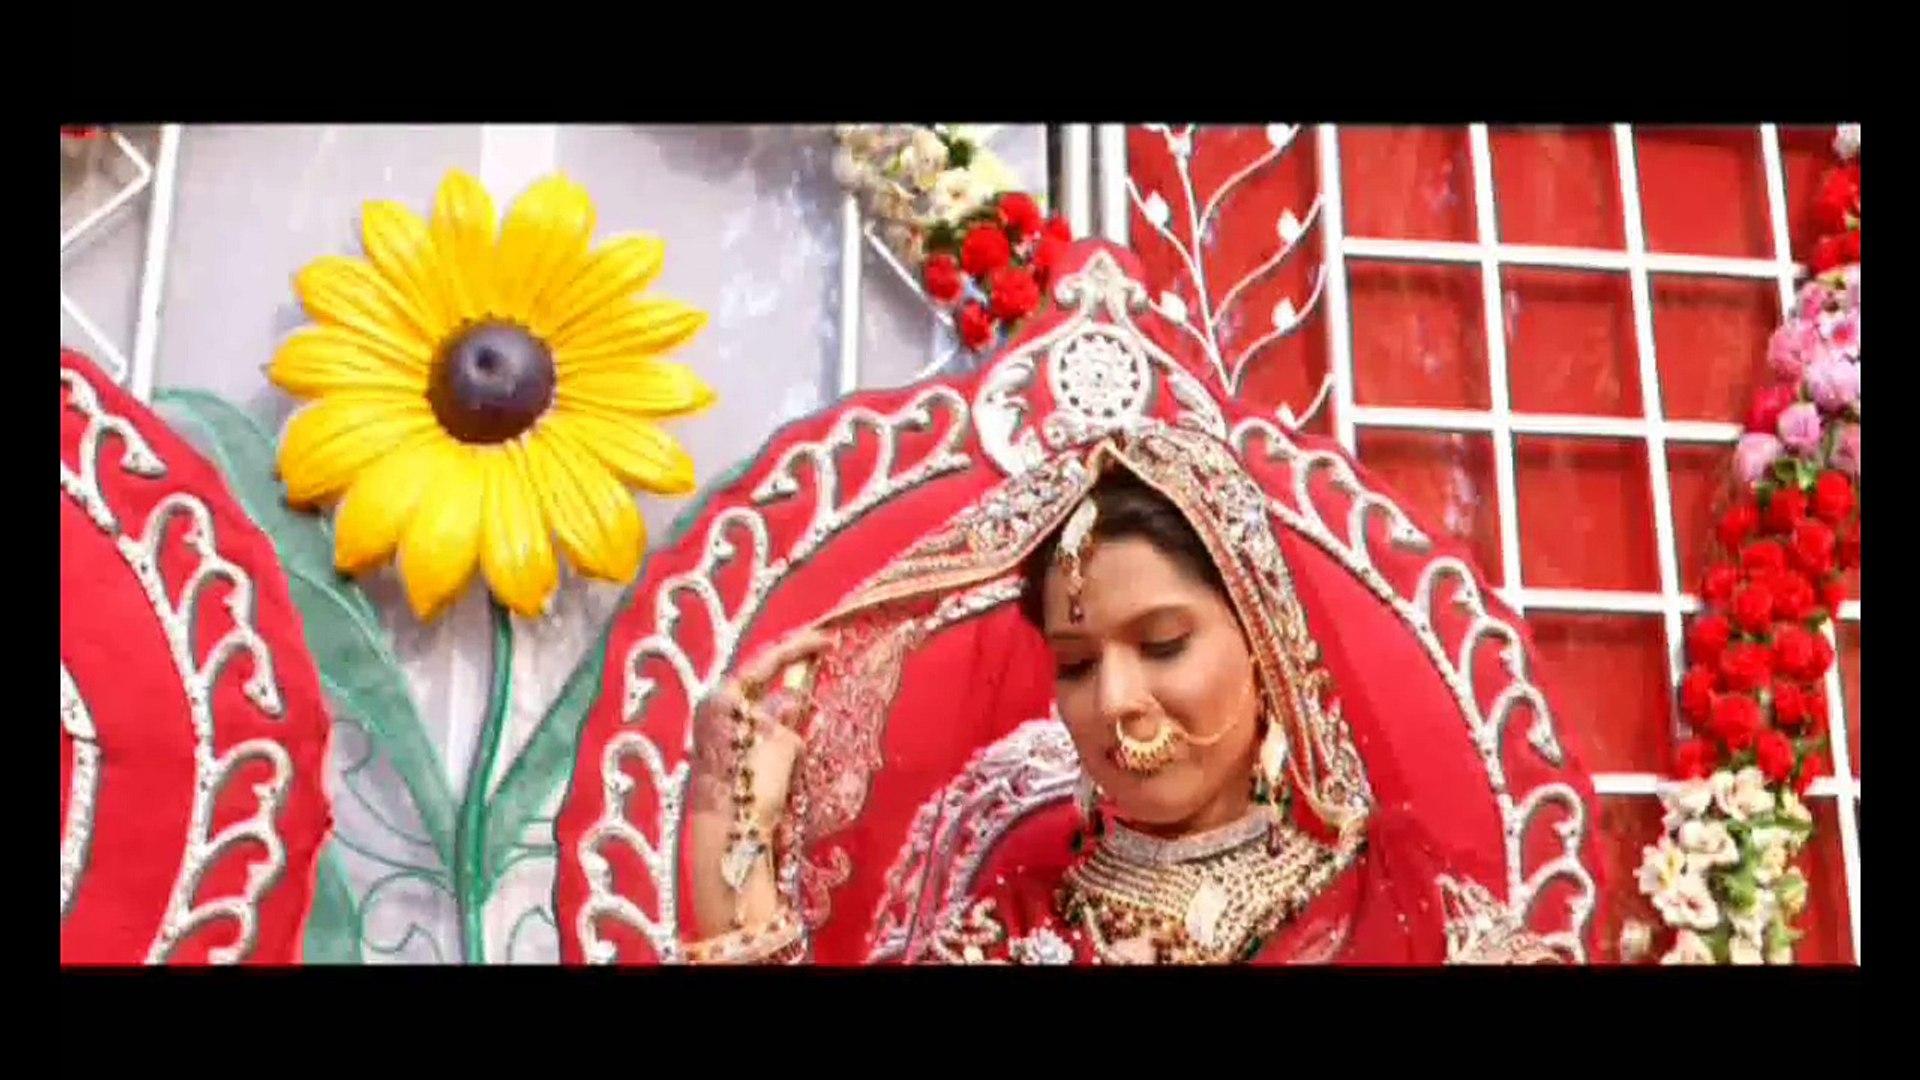 Badal Chhatey - Song - Movie: Tere Ishq Mein Qurbaan - Singers: Udit Narayan, Madhushree